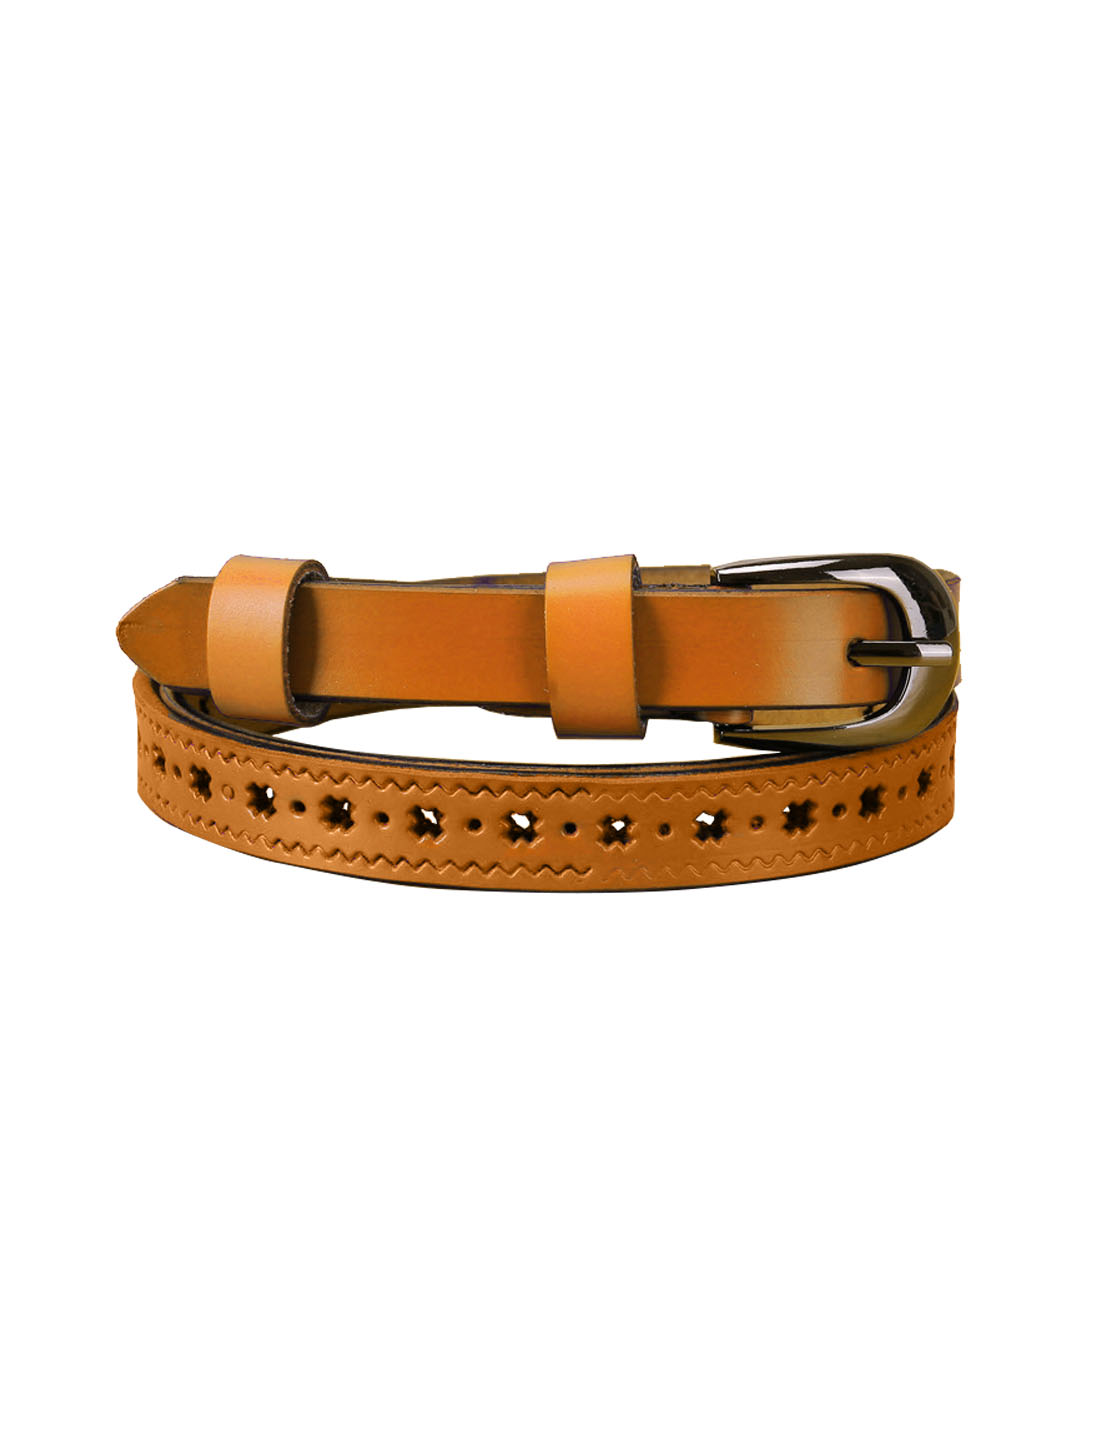 Women Stars Hollow Alloy Pin Buckle Faux Leather Belt Camel